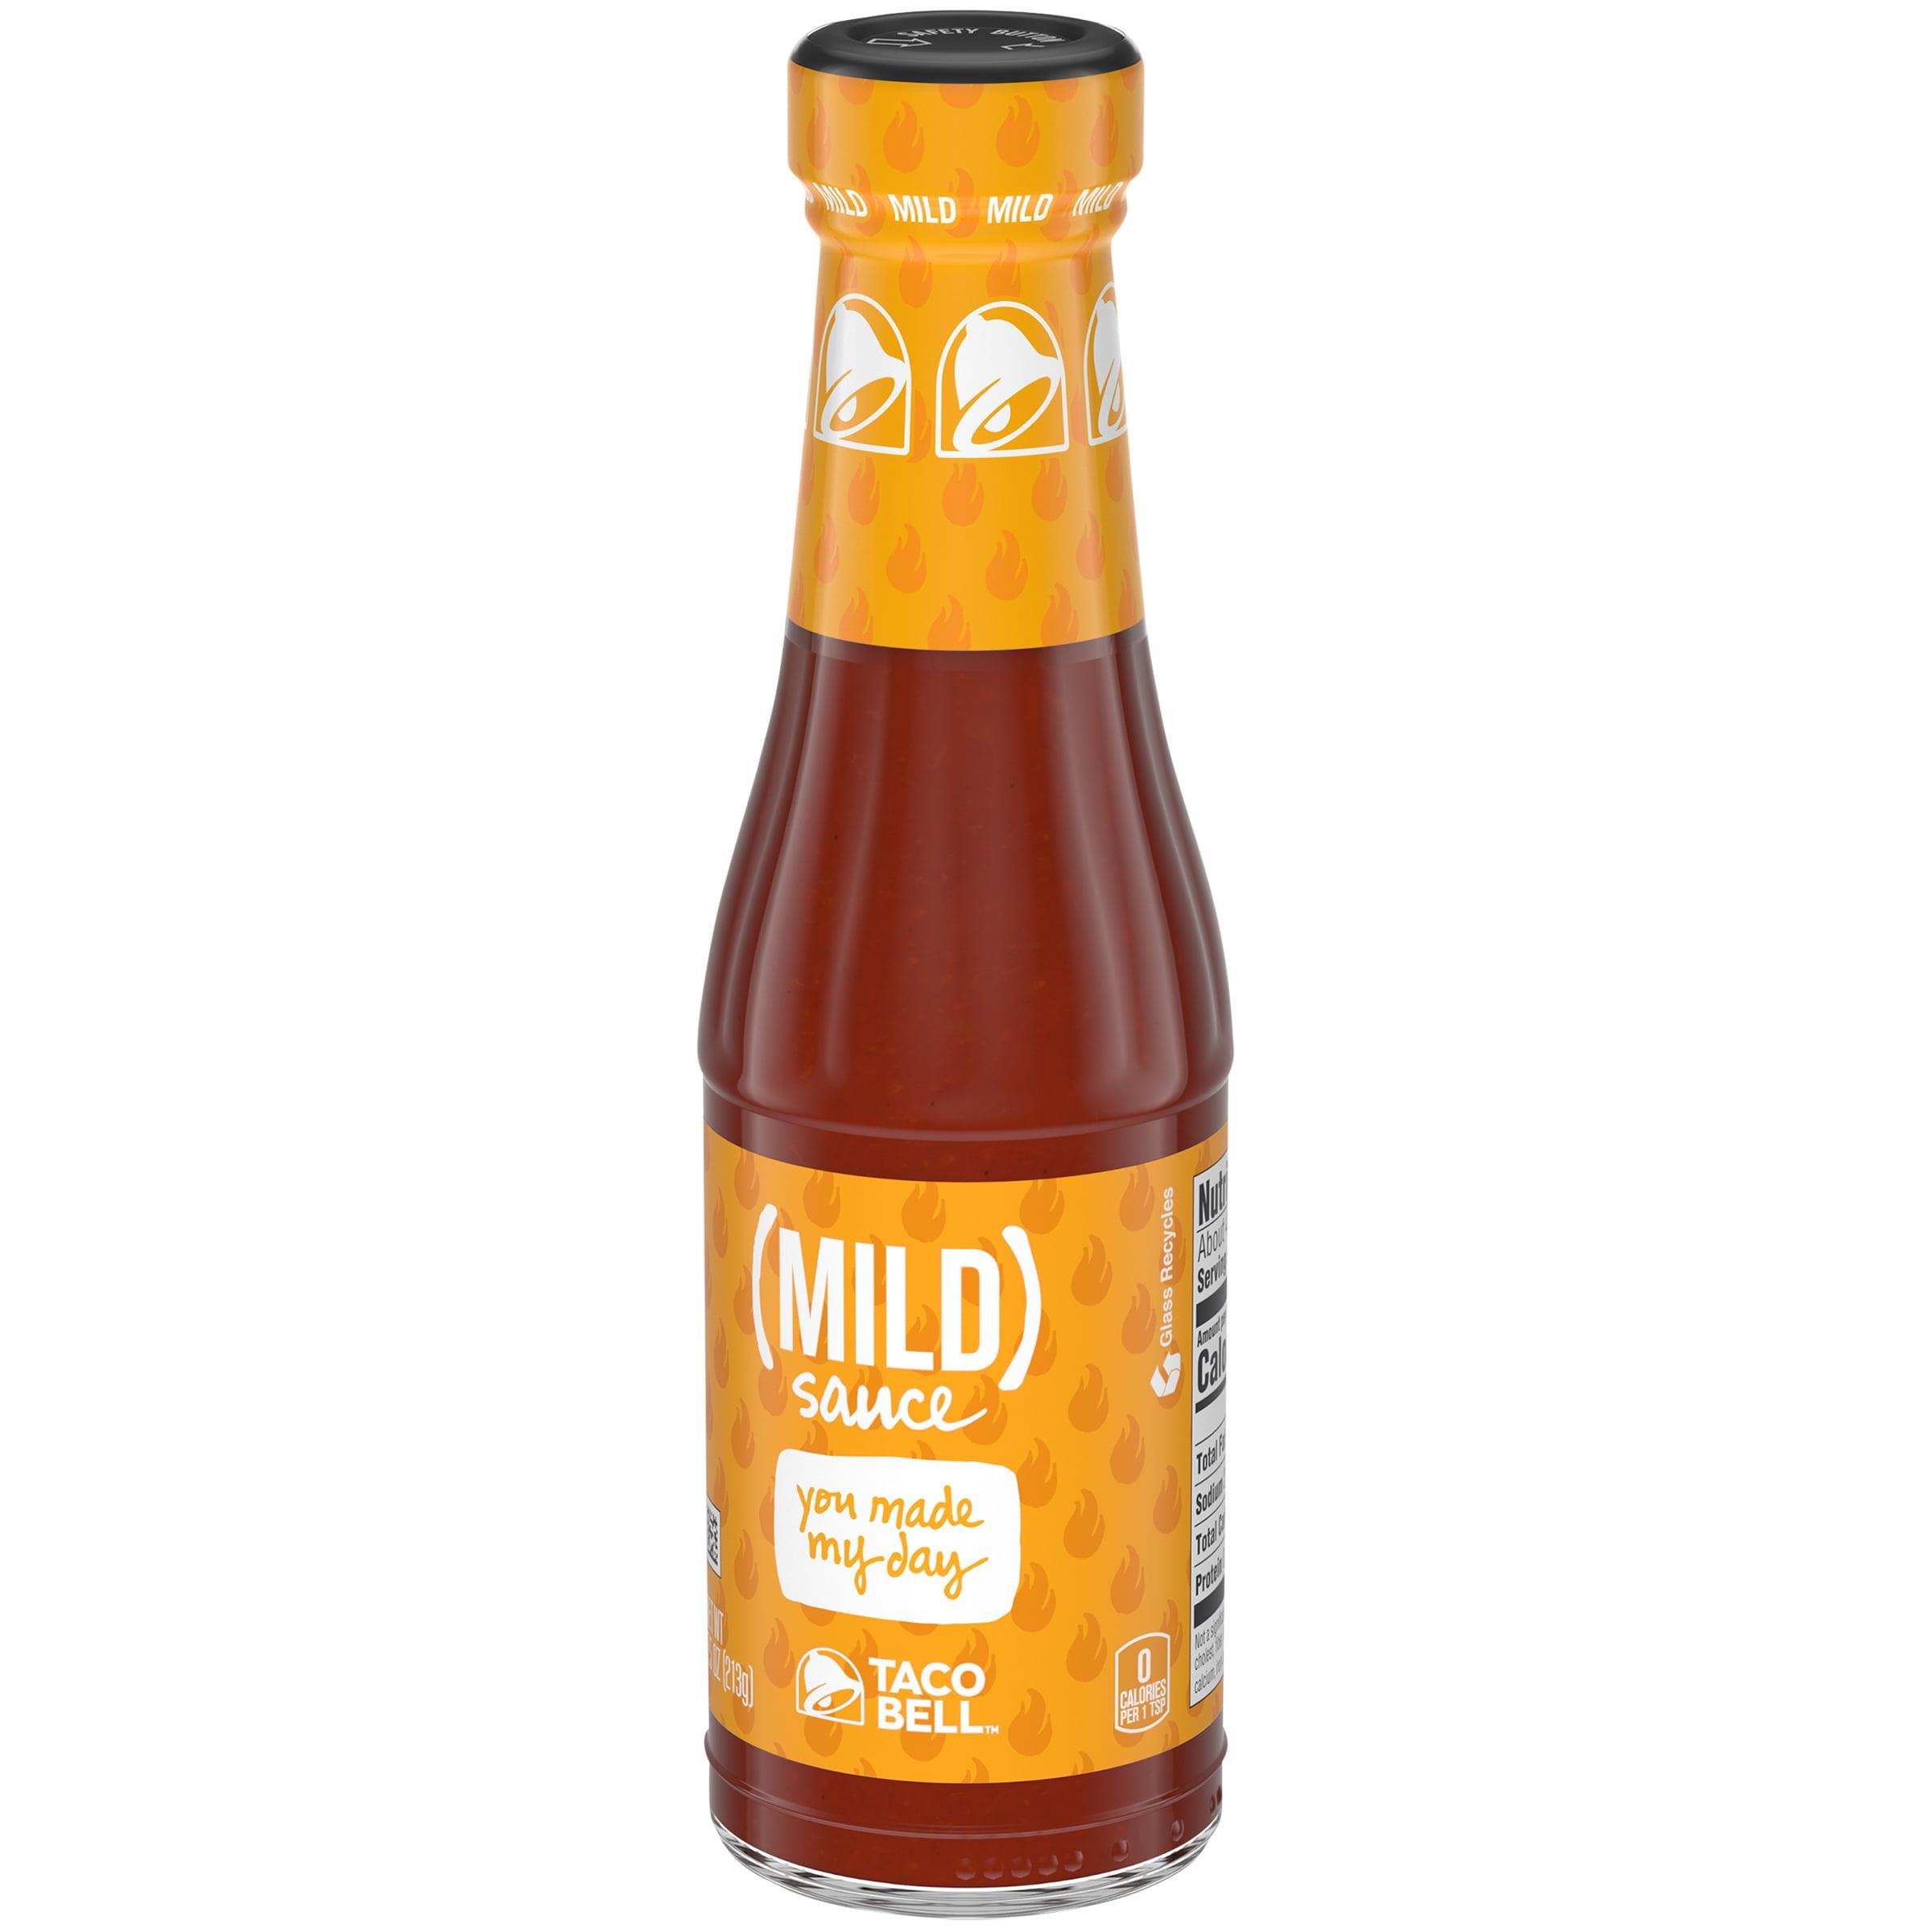 Taco Bell Mild Sauce, 7.5 oz Bottle - Walmart.com